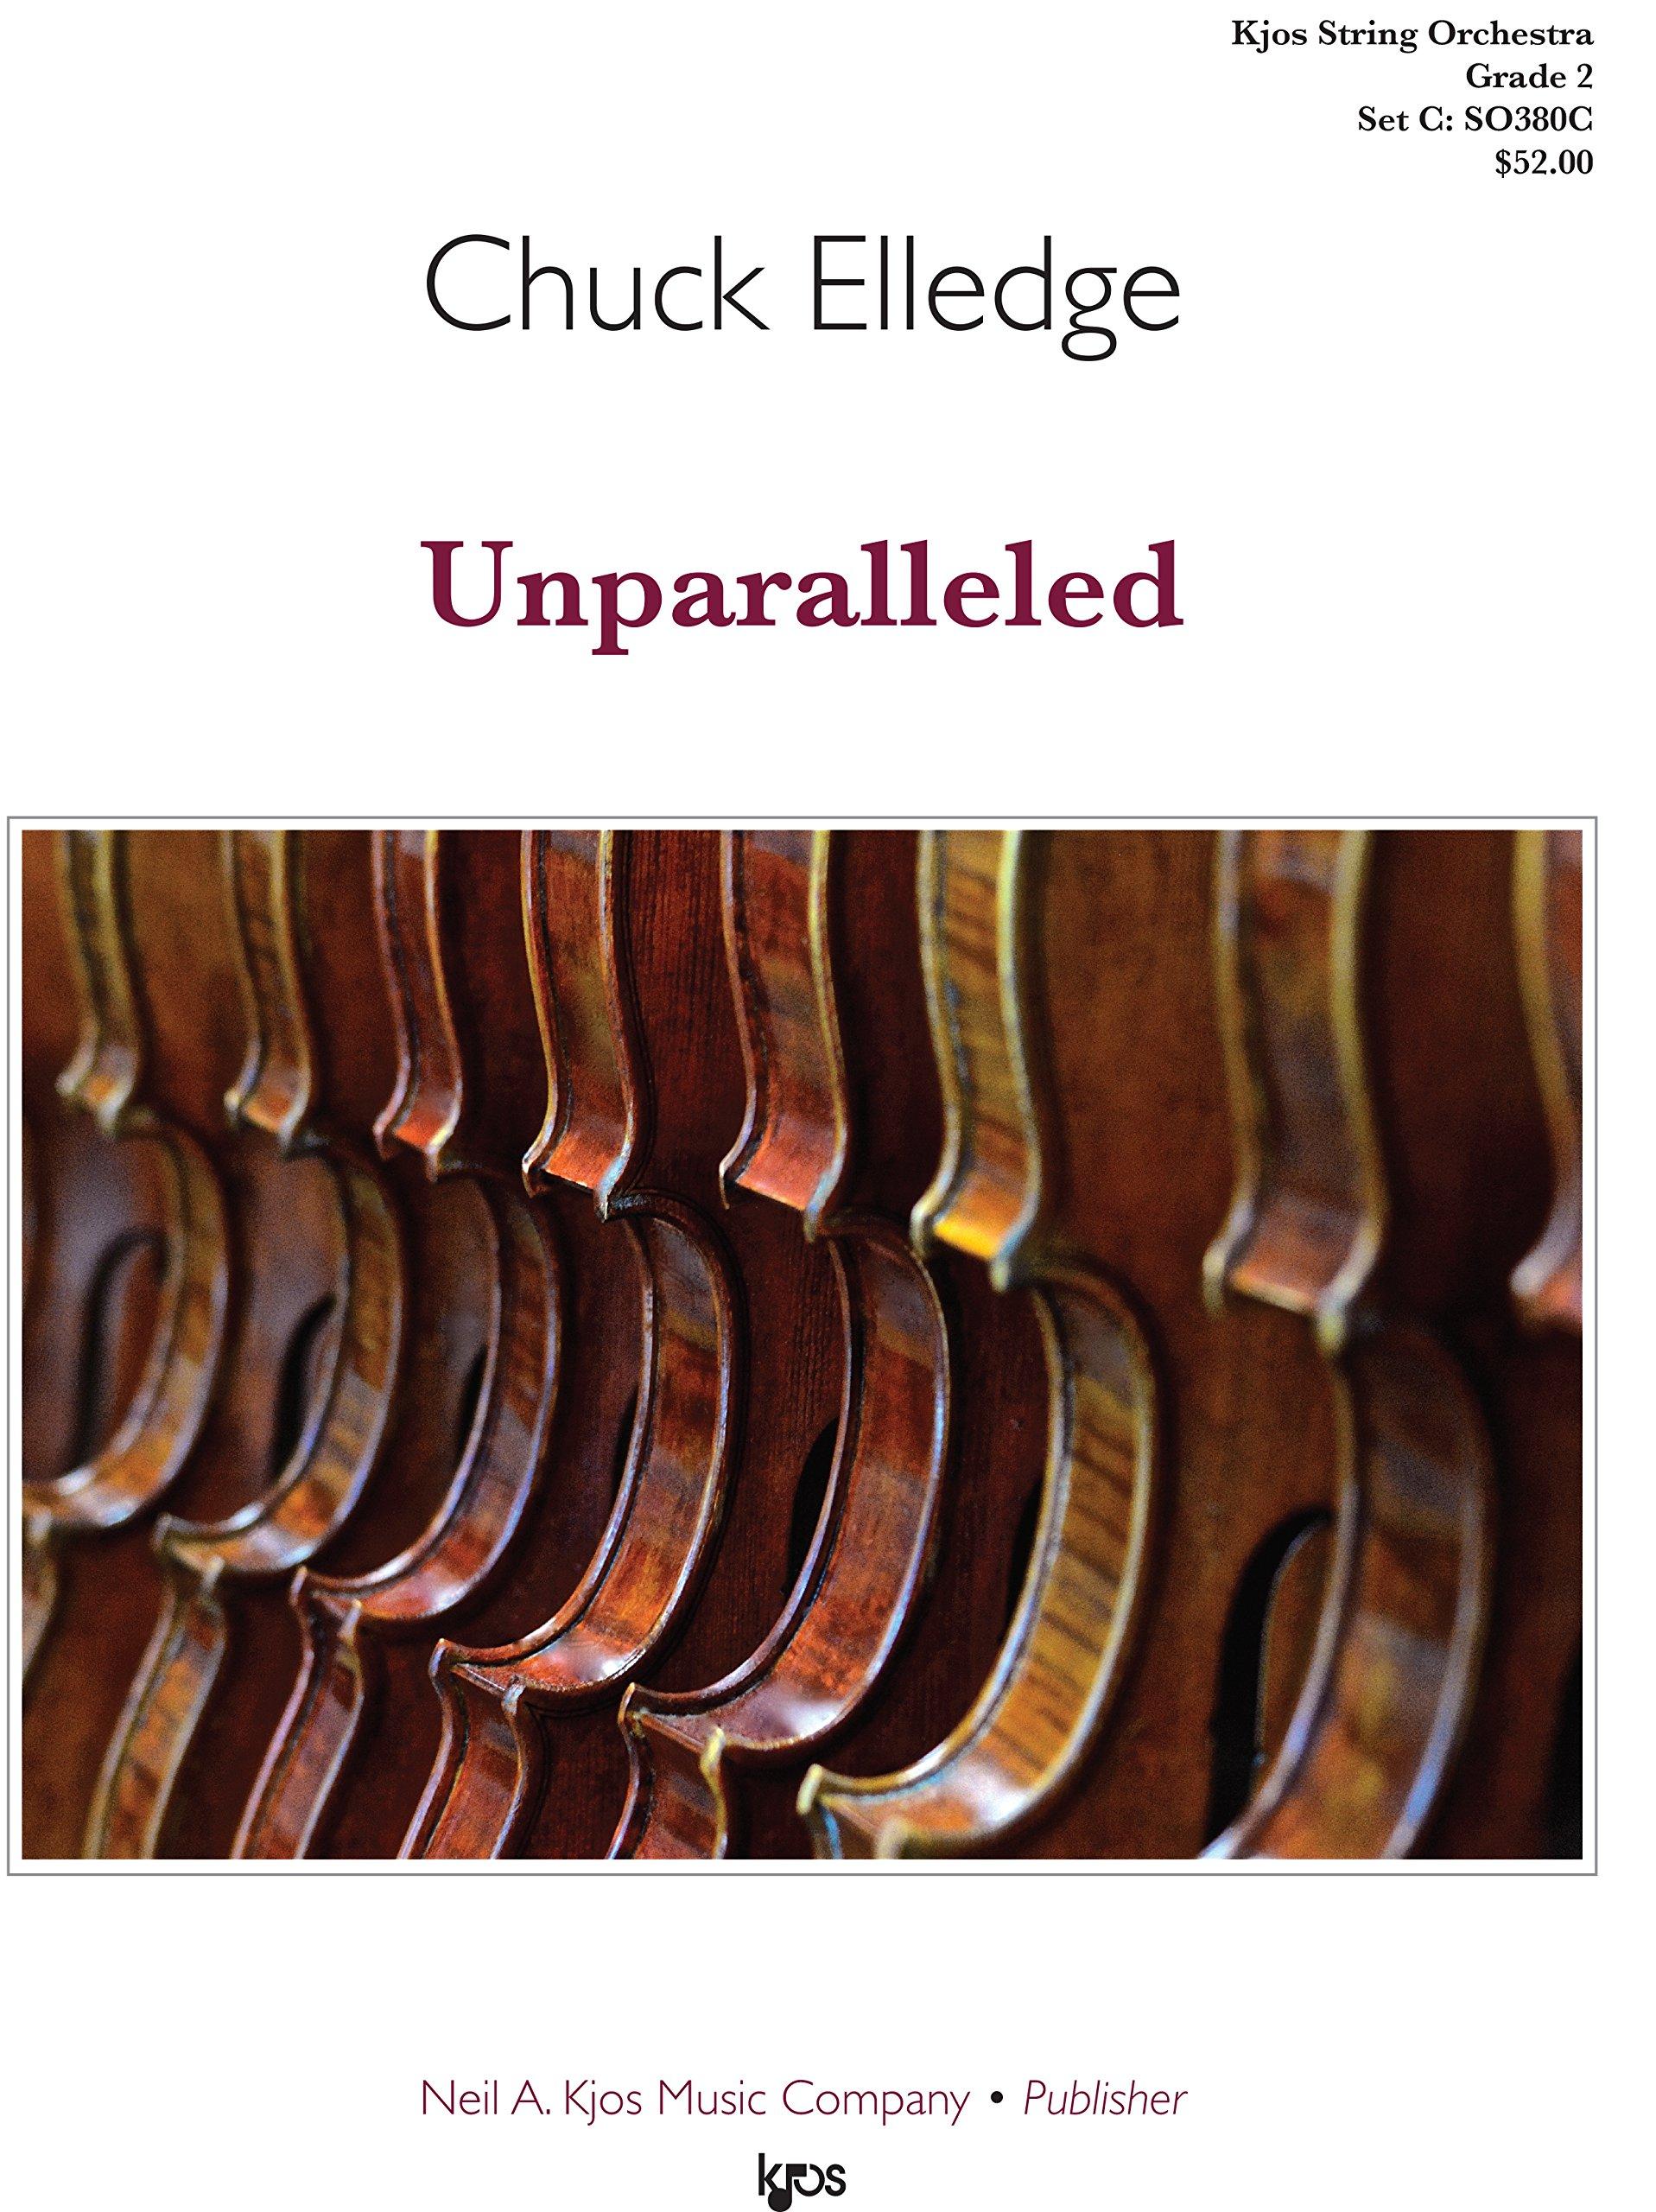 Elledge, Chuck - Unparalleled